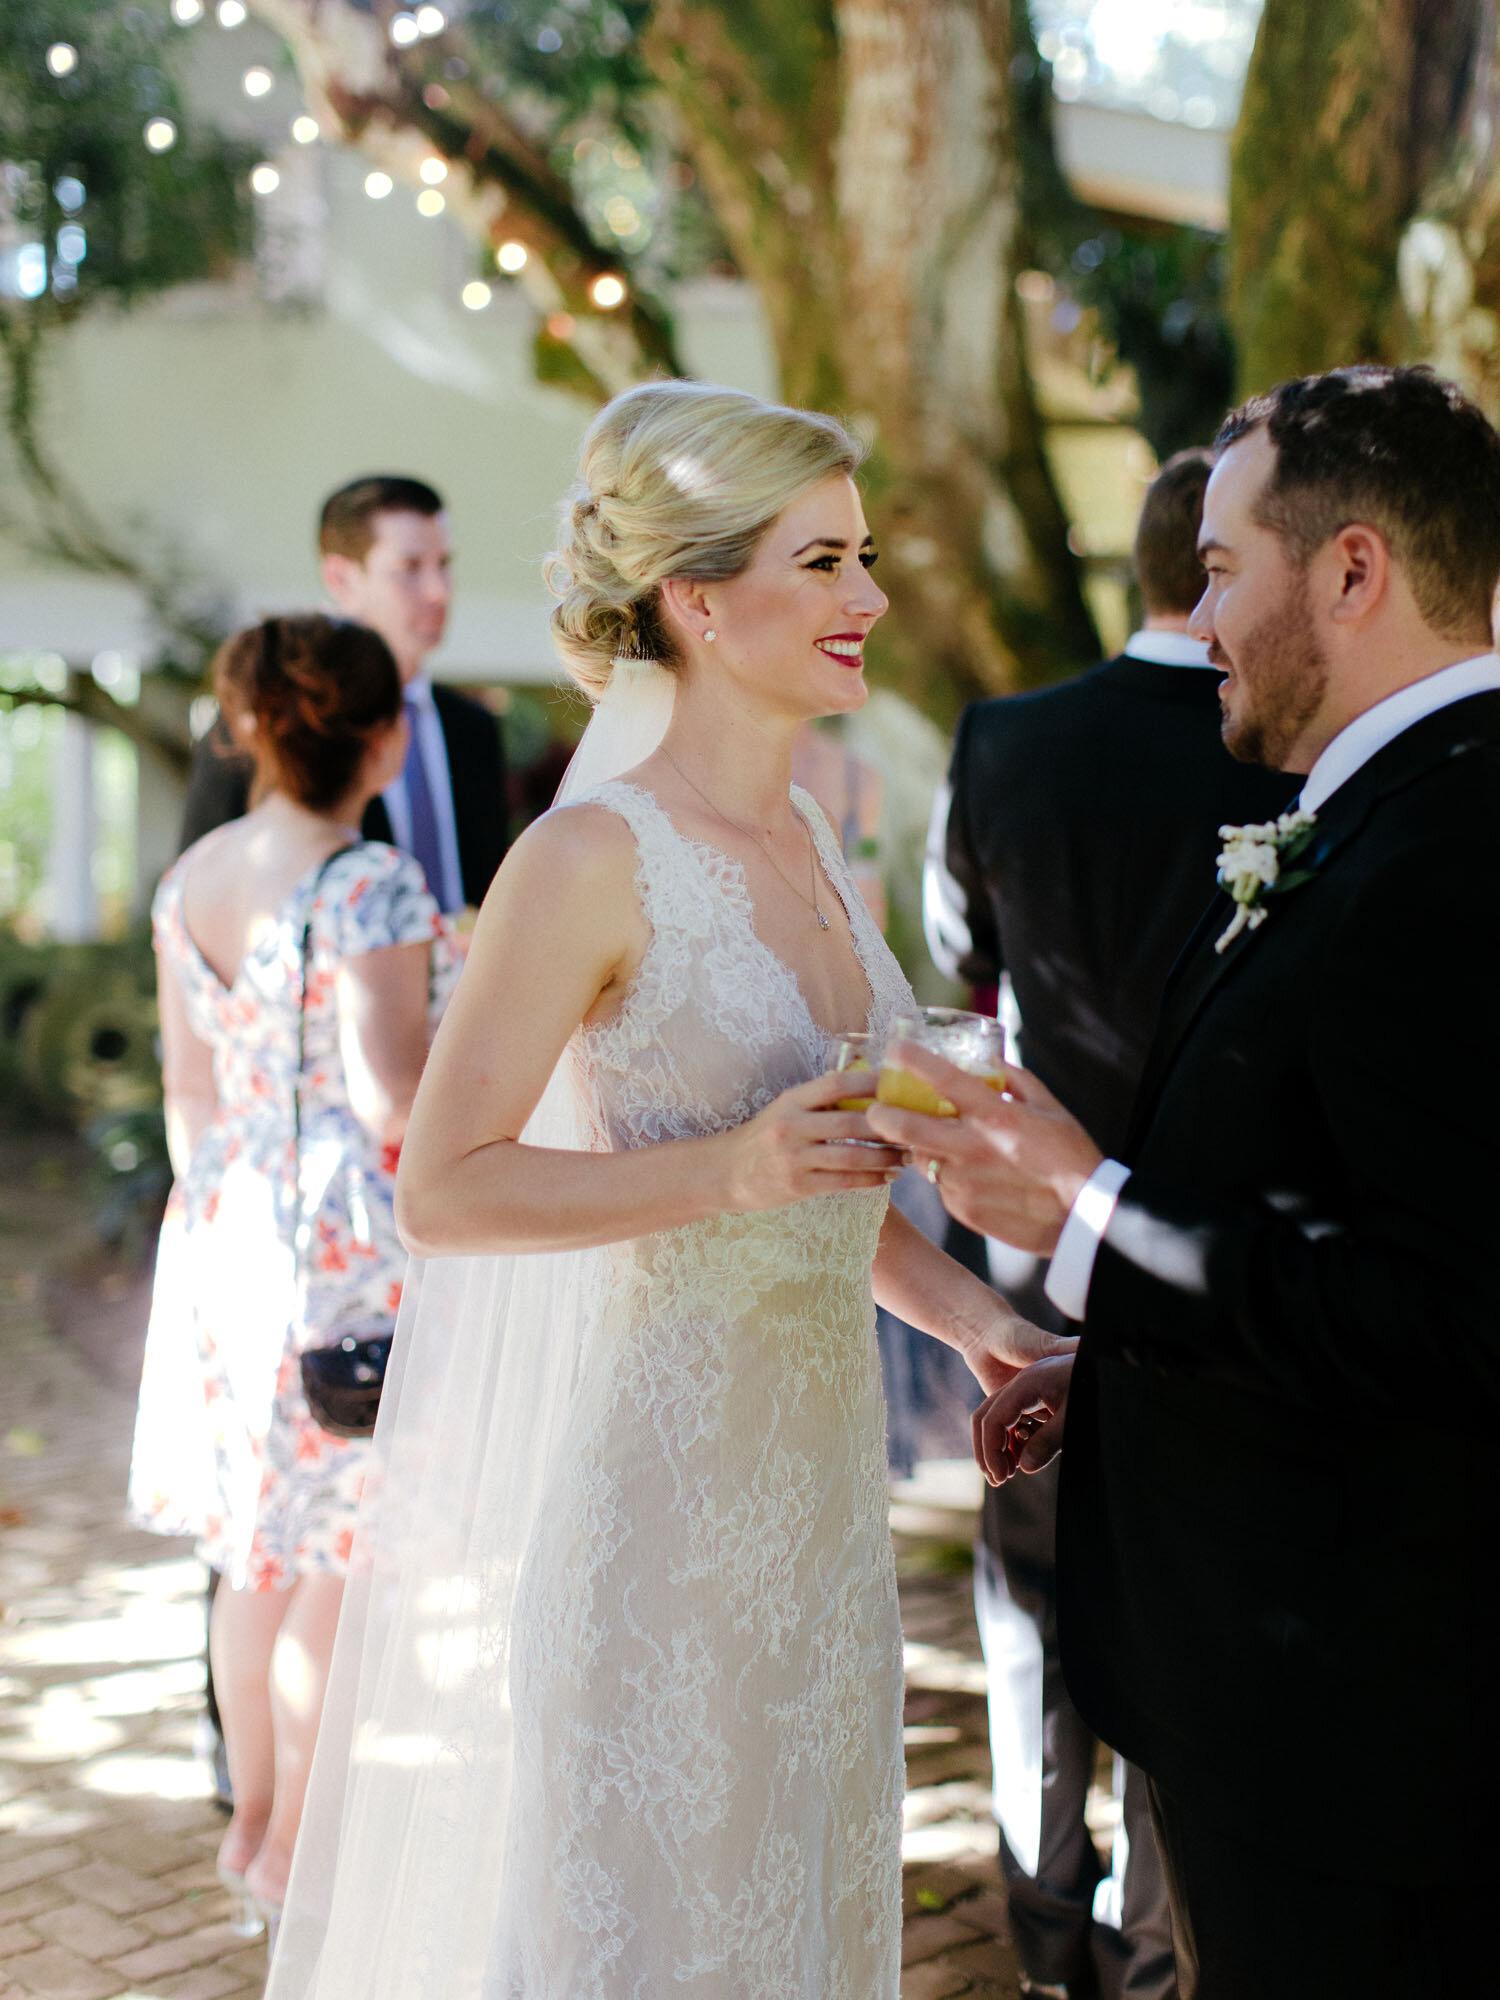 Chris-J-Evans-Maui-Wedding-Kim&Brian2913.jpg